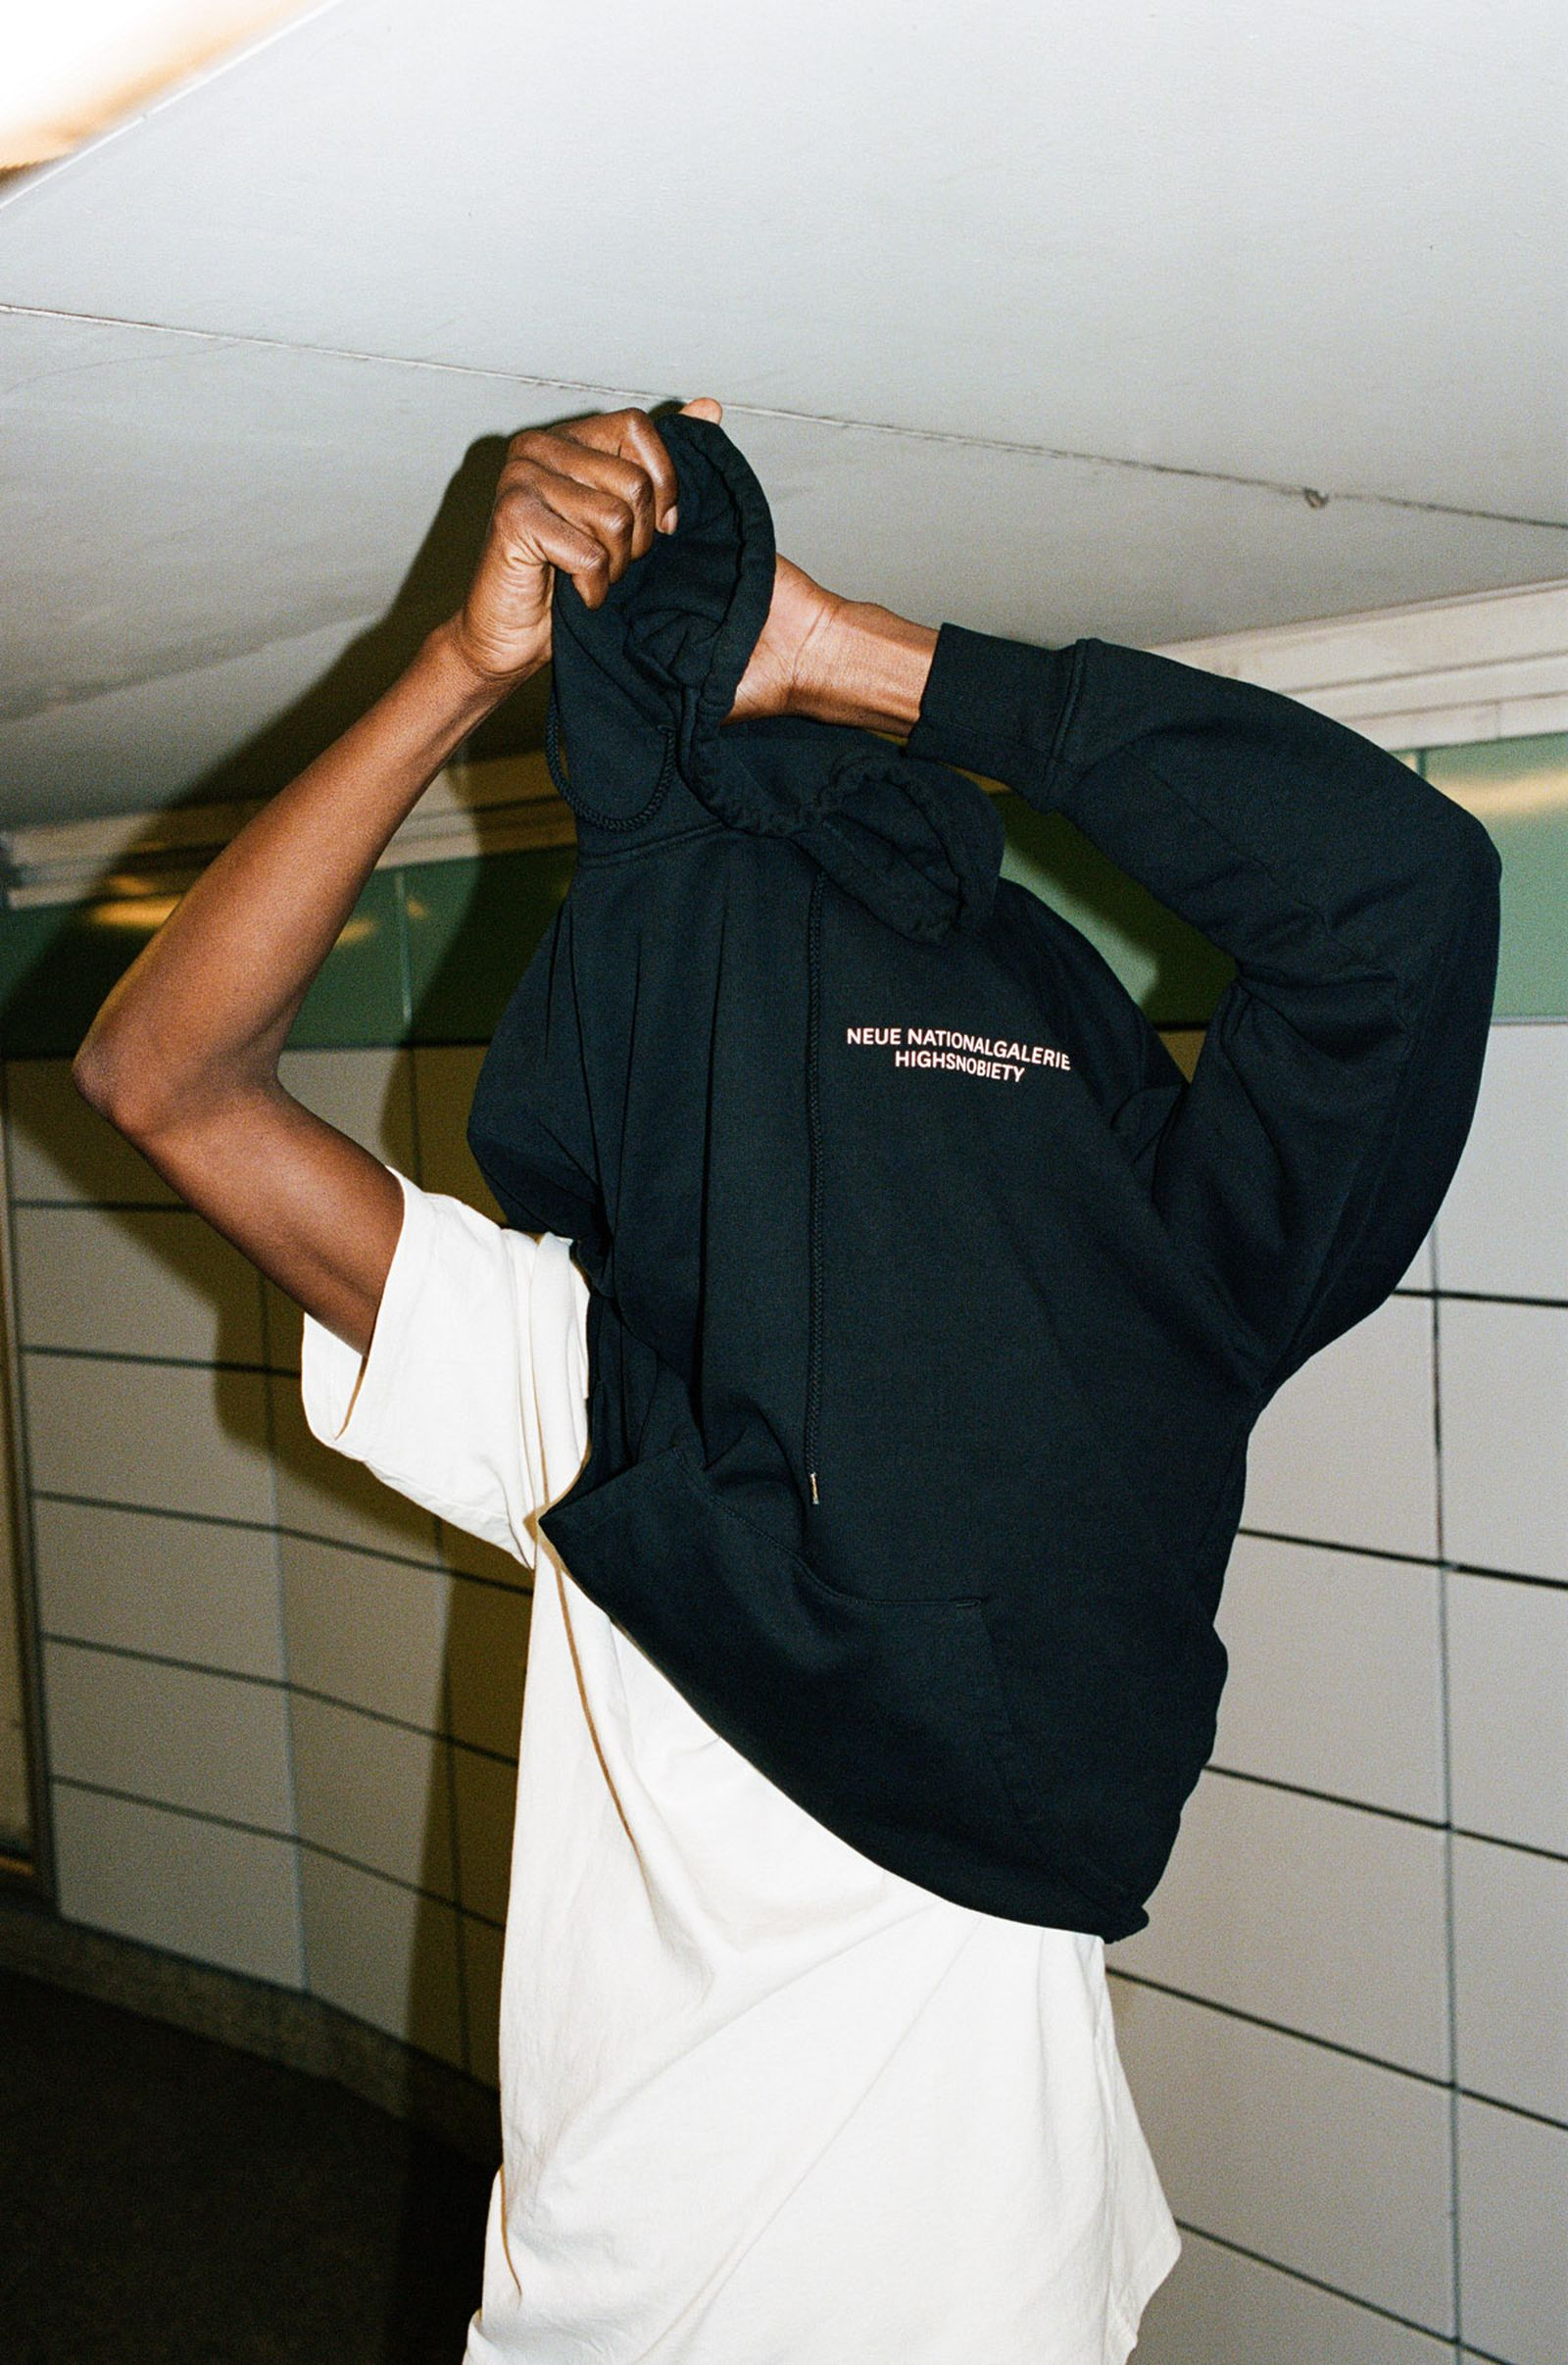 berlin-berlin-merch-lookbook-016